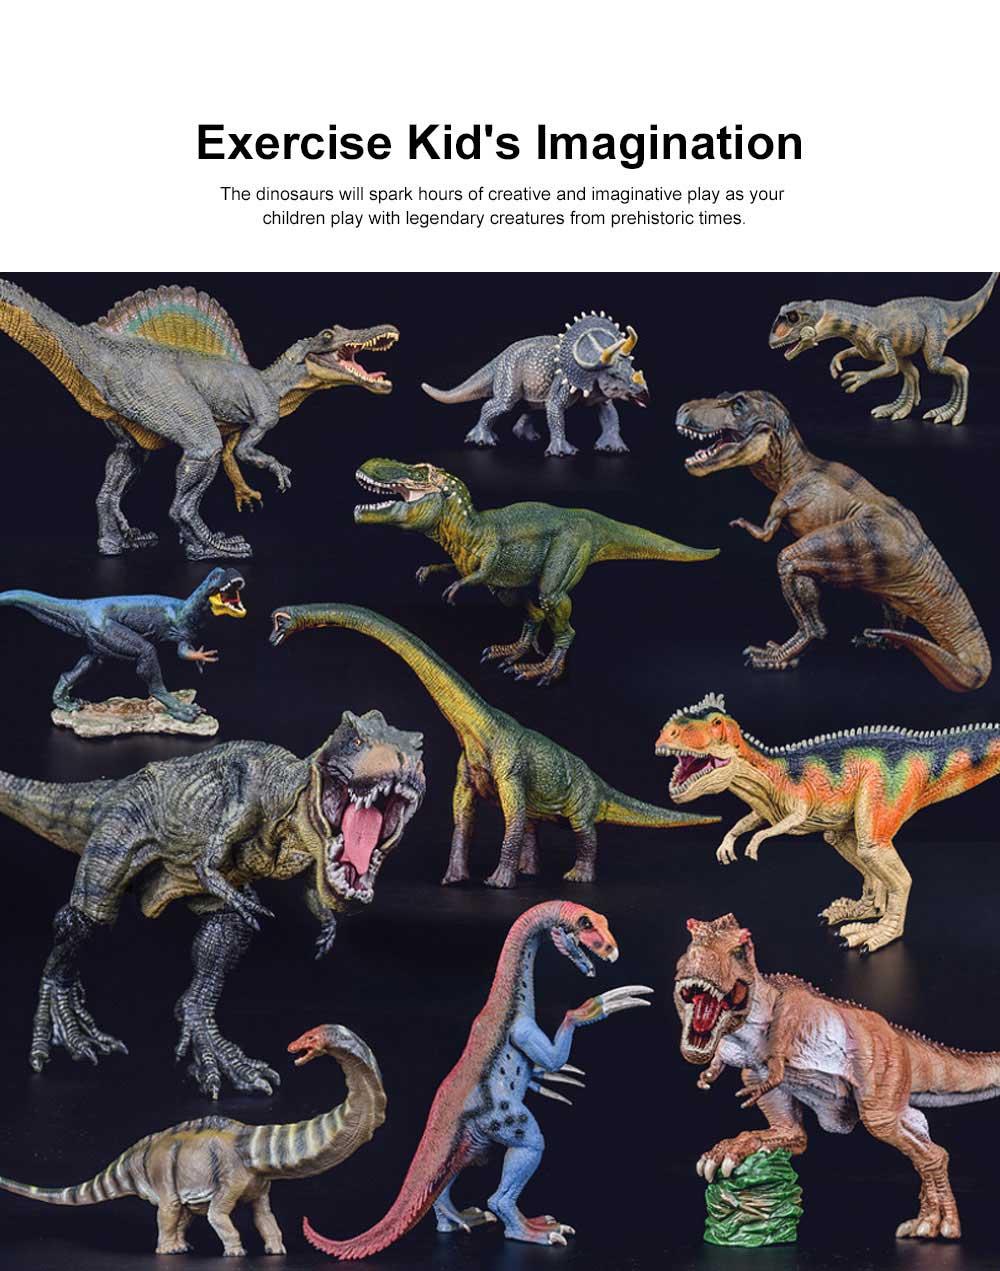 Simulation Dinosaur Toy Solid, No Stitching PVC Dinosaur Model, Educational Realistic Dinosaur Figure Tyrannosaurus Rex 3